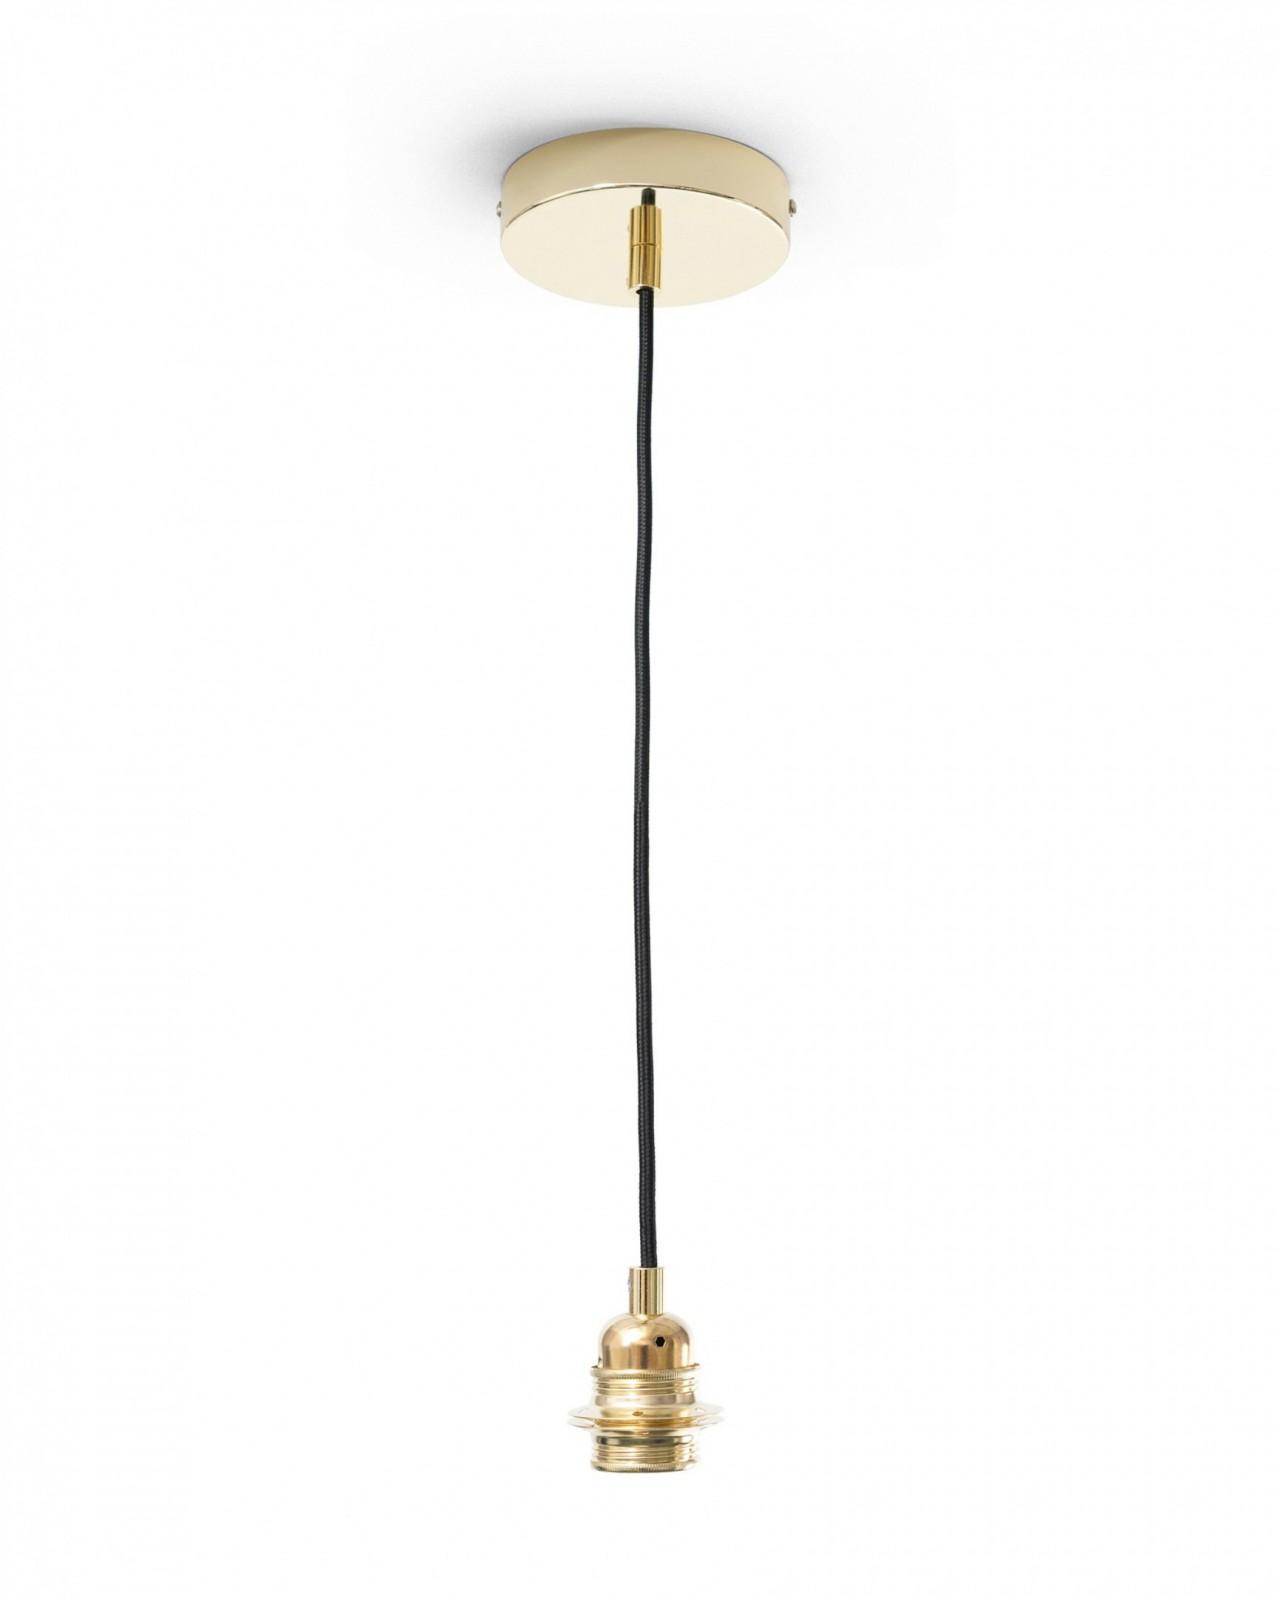 MINDTHEGAP NAVAL CREST Pendant Lamp